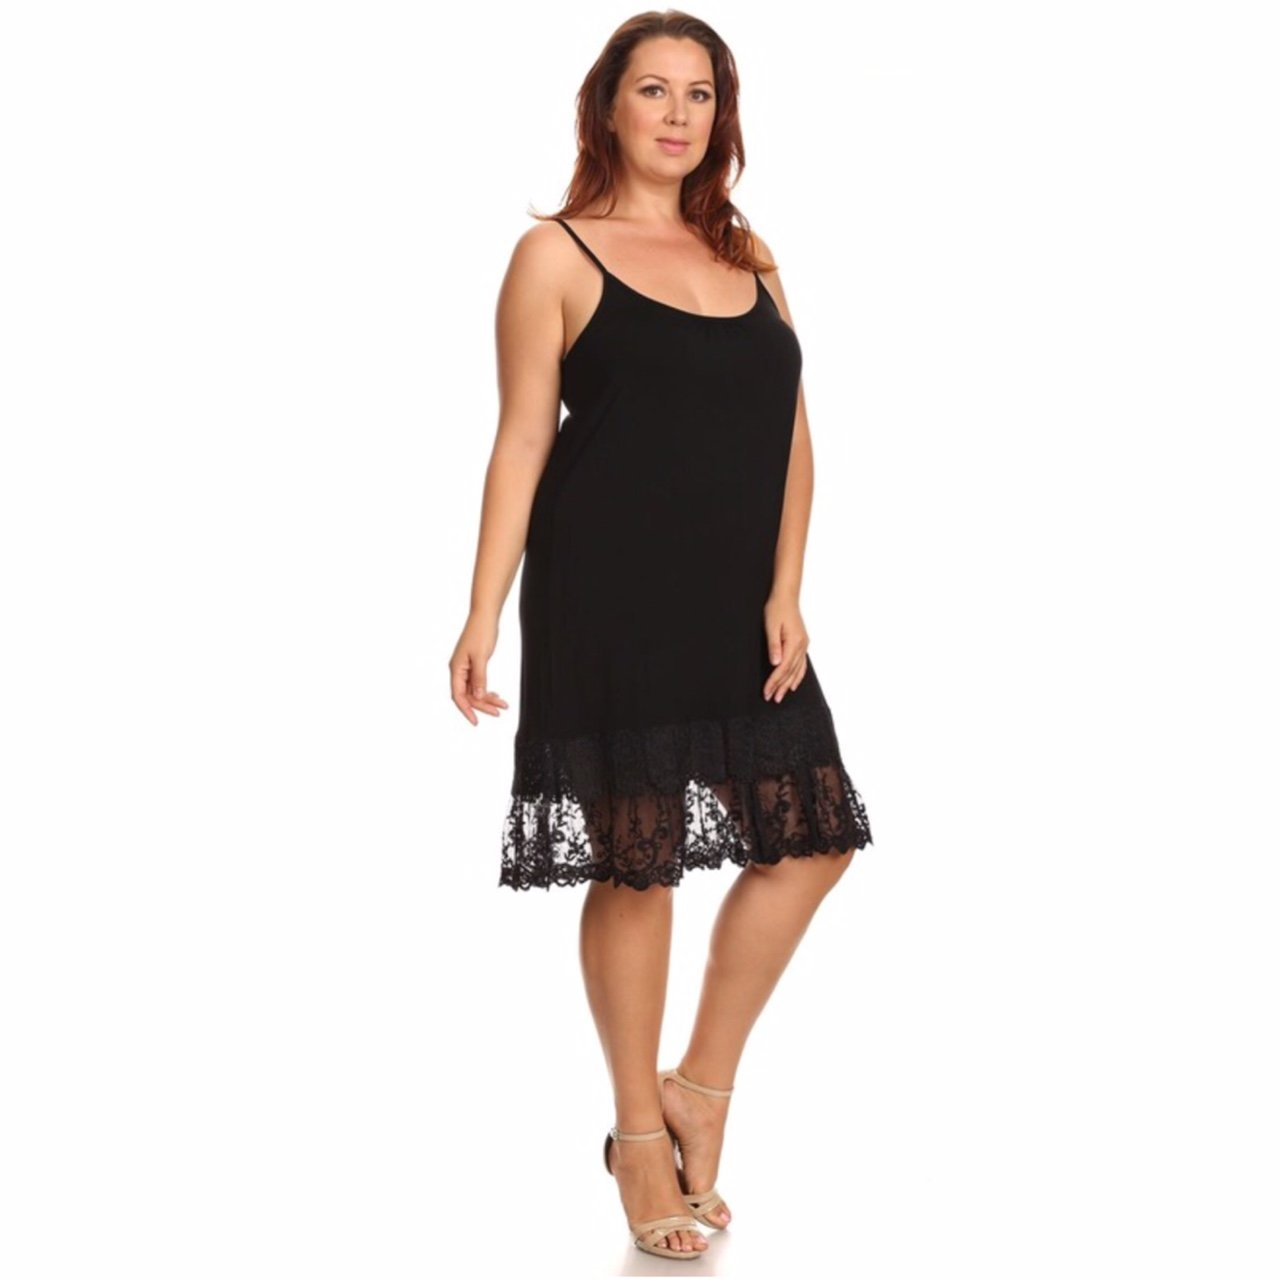 e1531e93f8fbe Black Crochet Lace Layered Dress – Little Black Dress | Black Lace ...